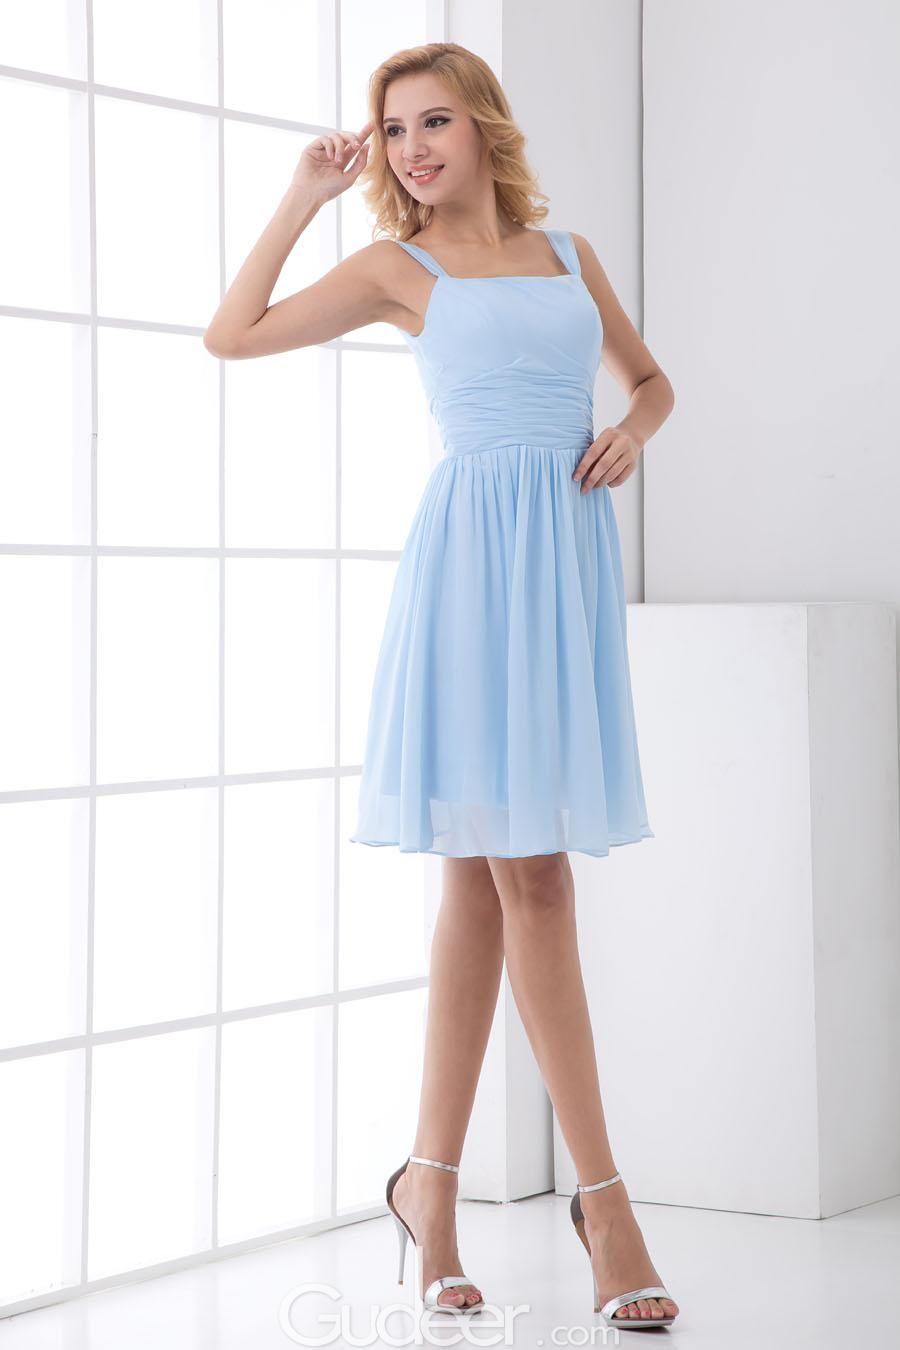 Light blue bridesmaid dresses chiffon google search my dream light blue bridesmaid dresses chiffon google search ombrellifo Image collections